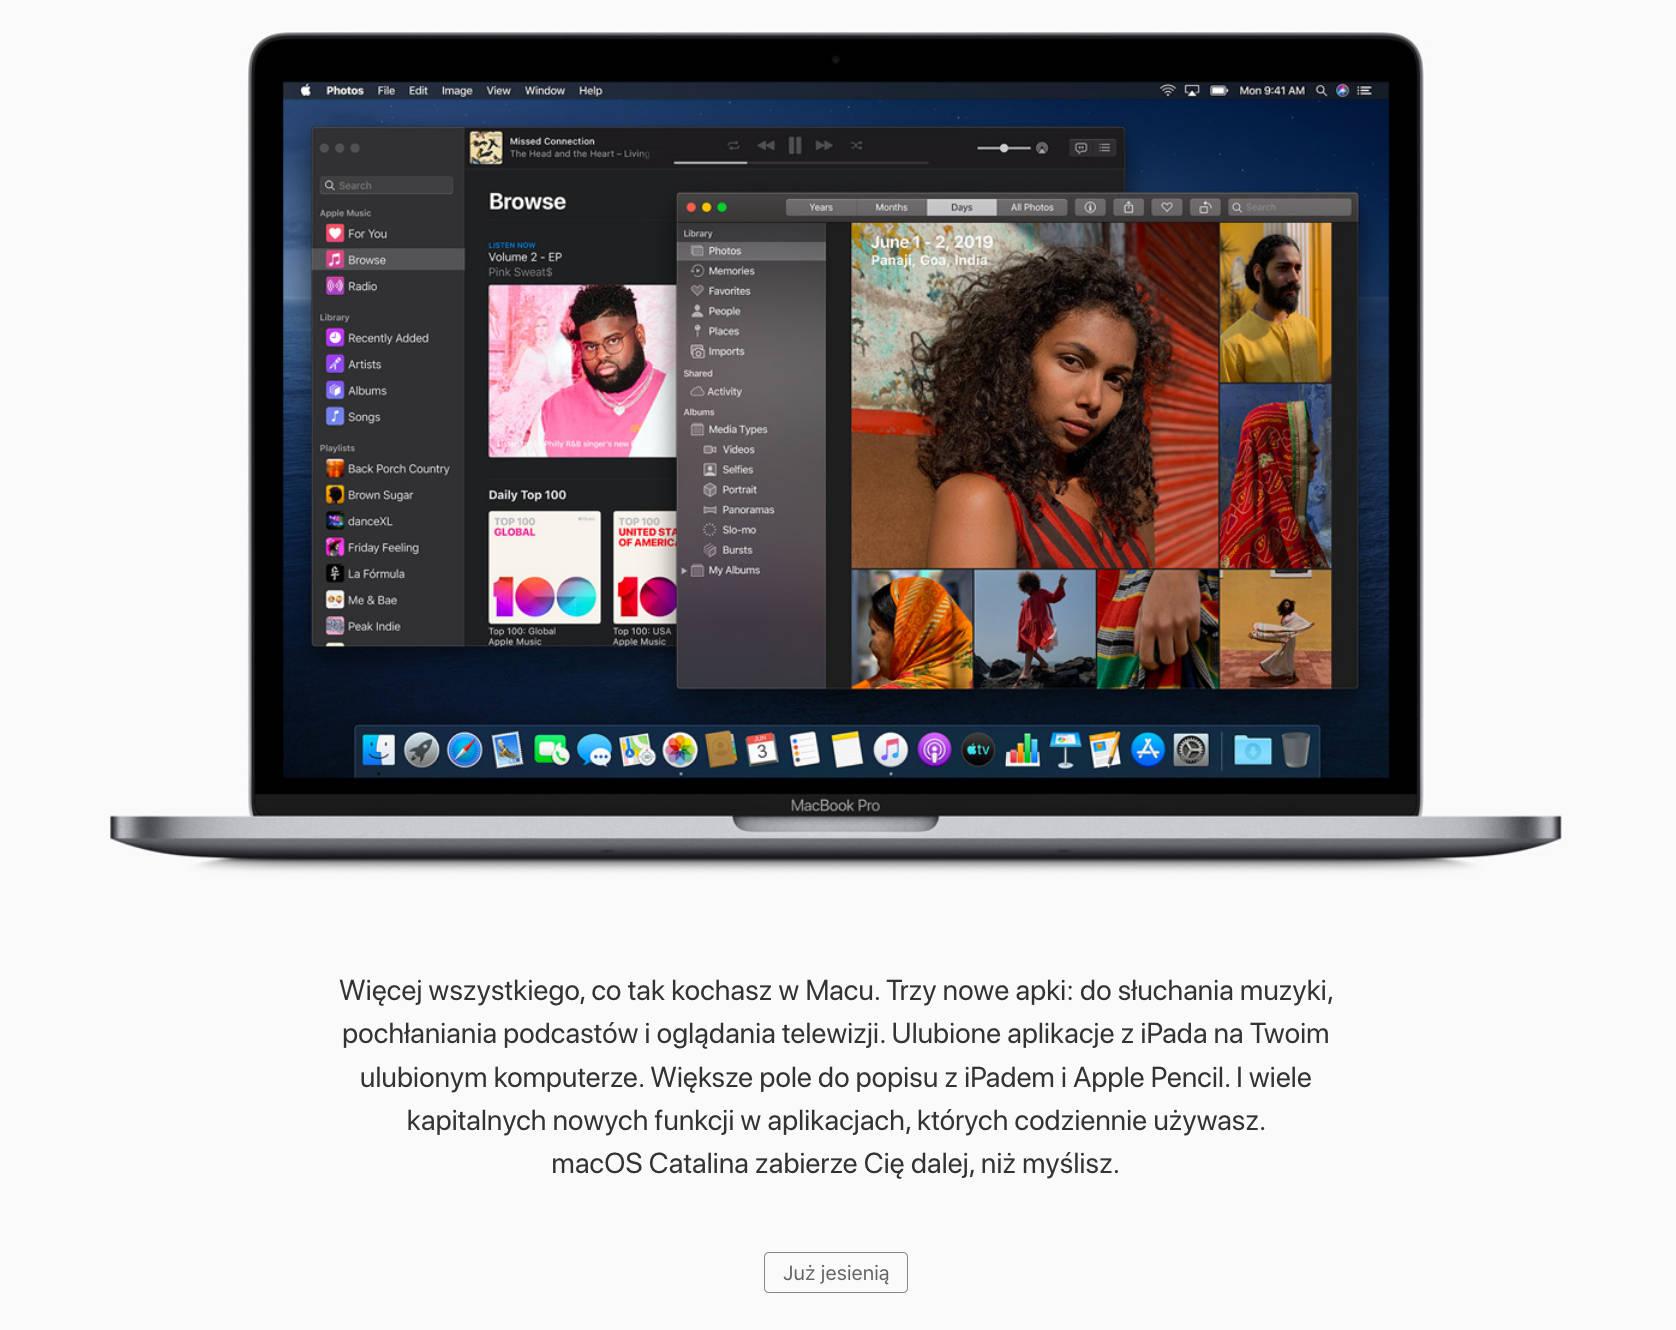 Apple macOS Catalina kiedy iOS 13 watchOS 6 tvOS 13 aktualizacja